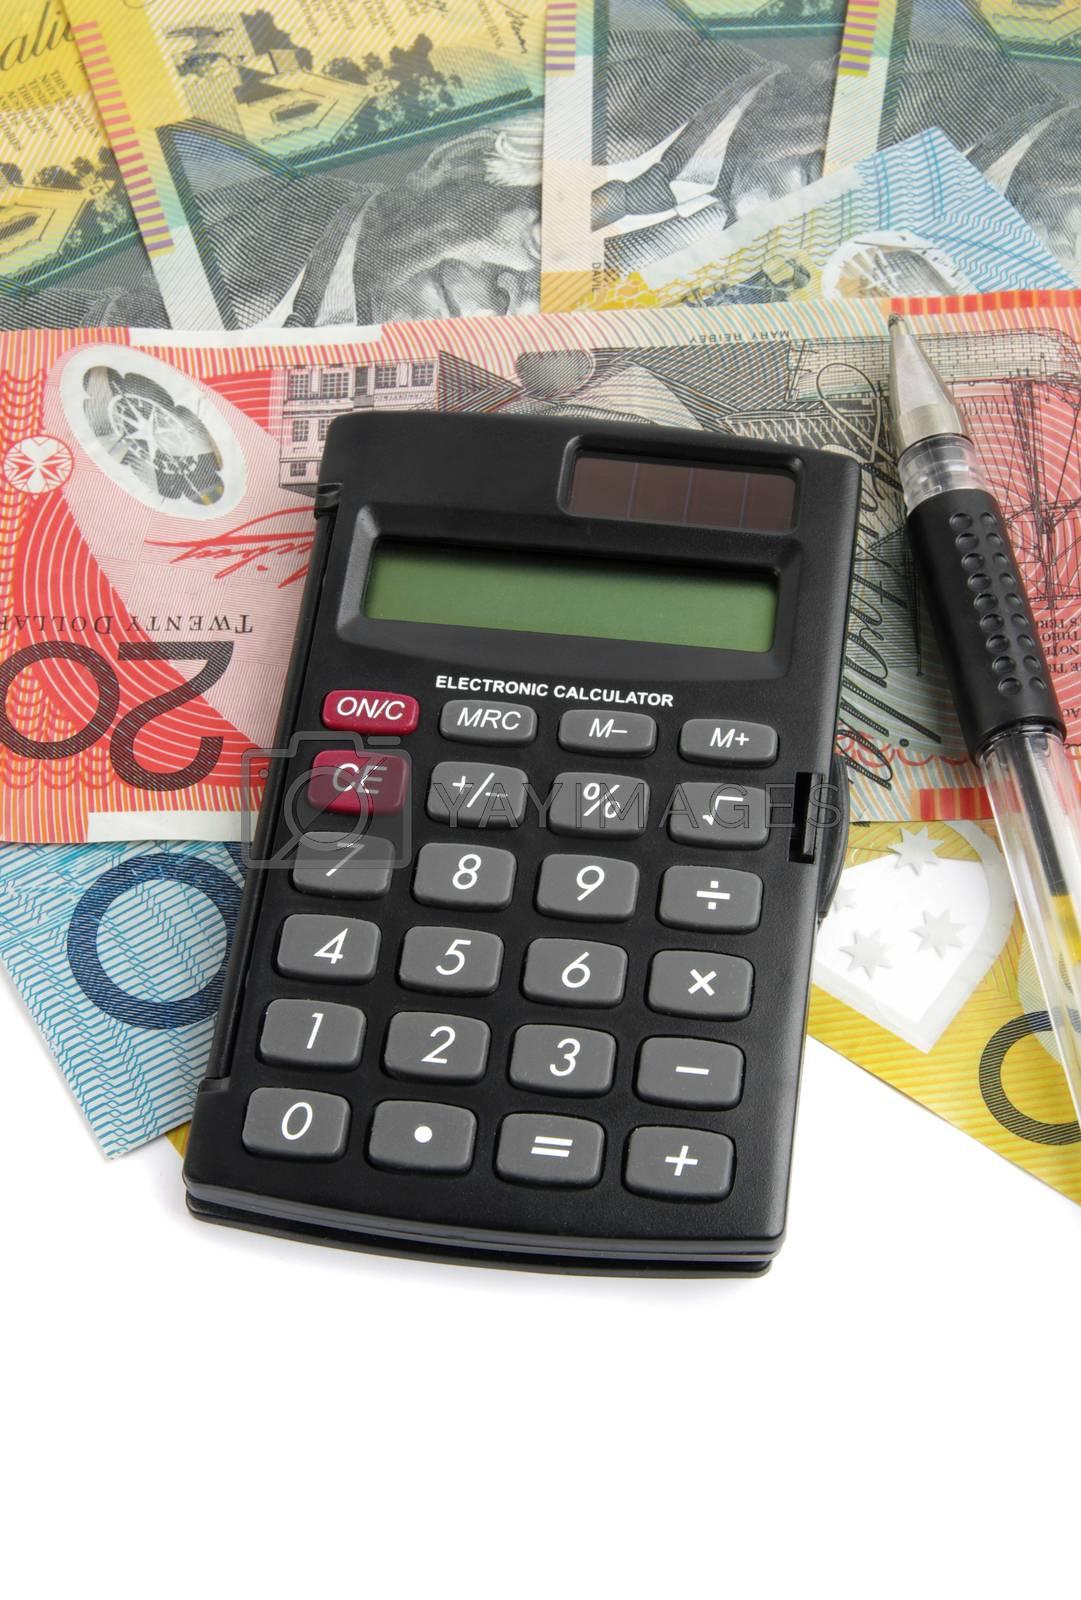 australian money with calculator over white